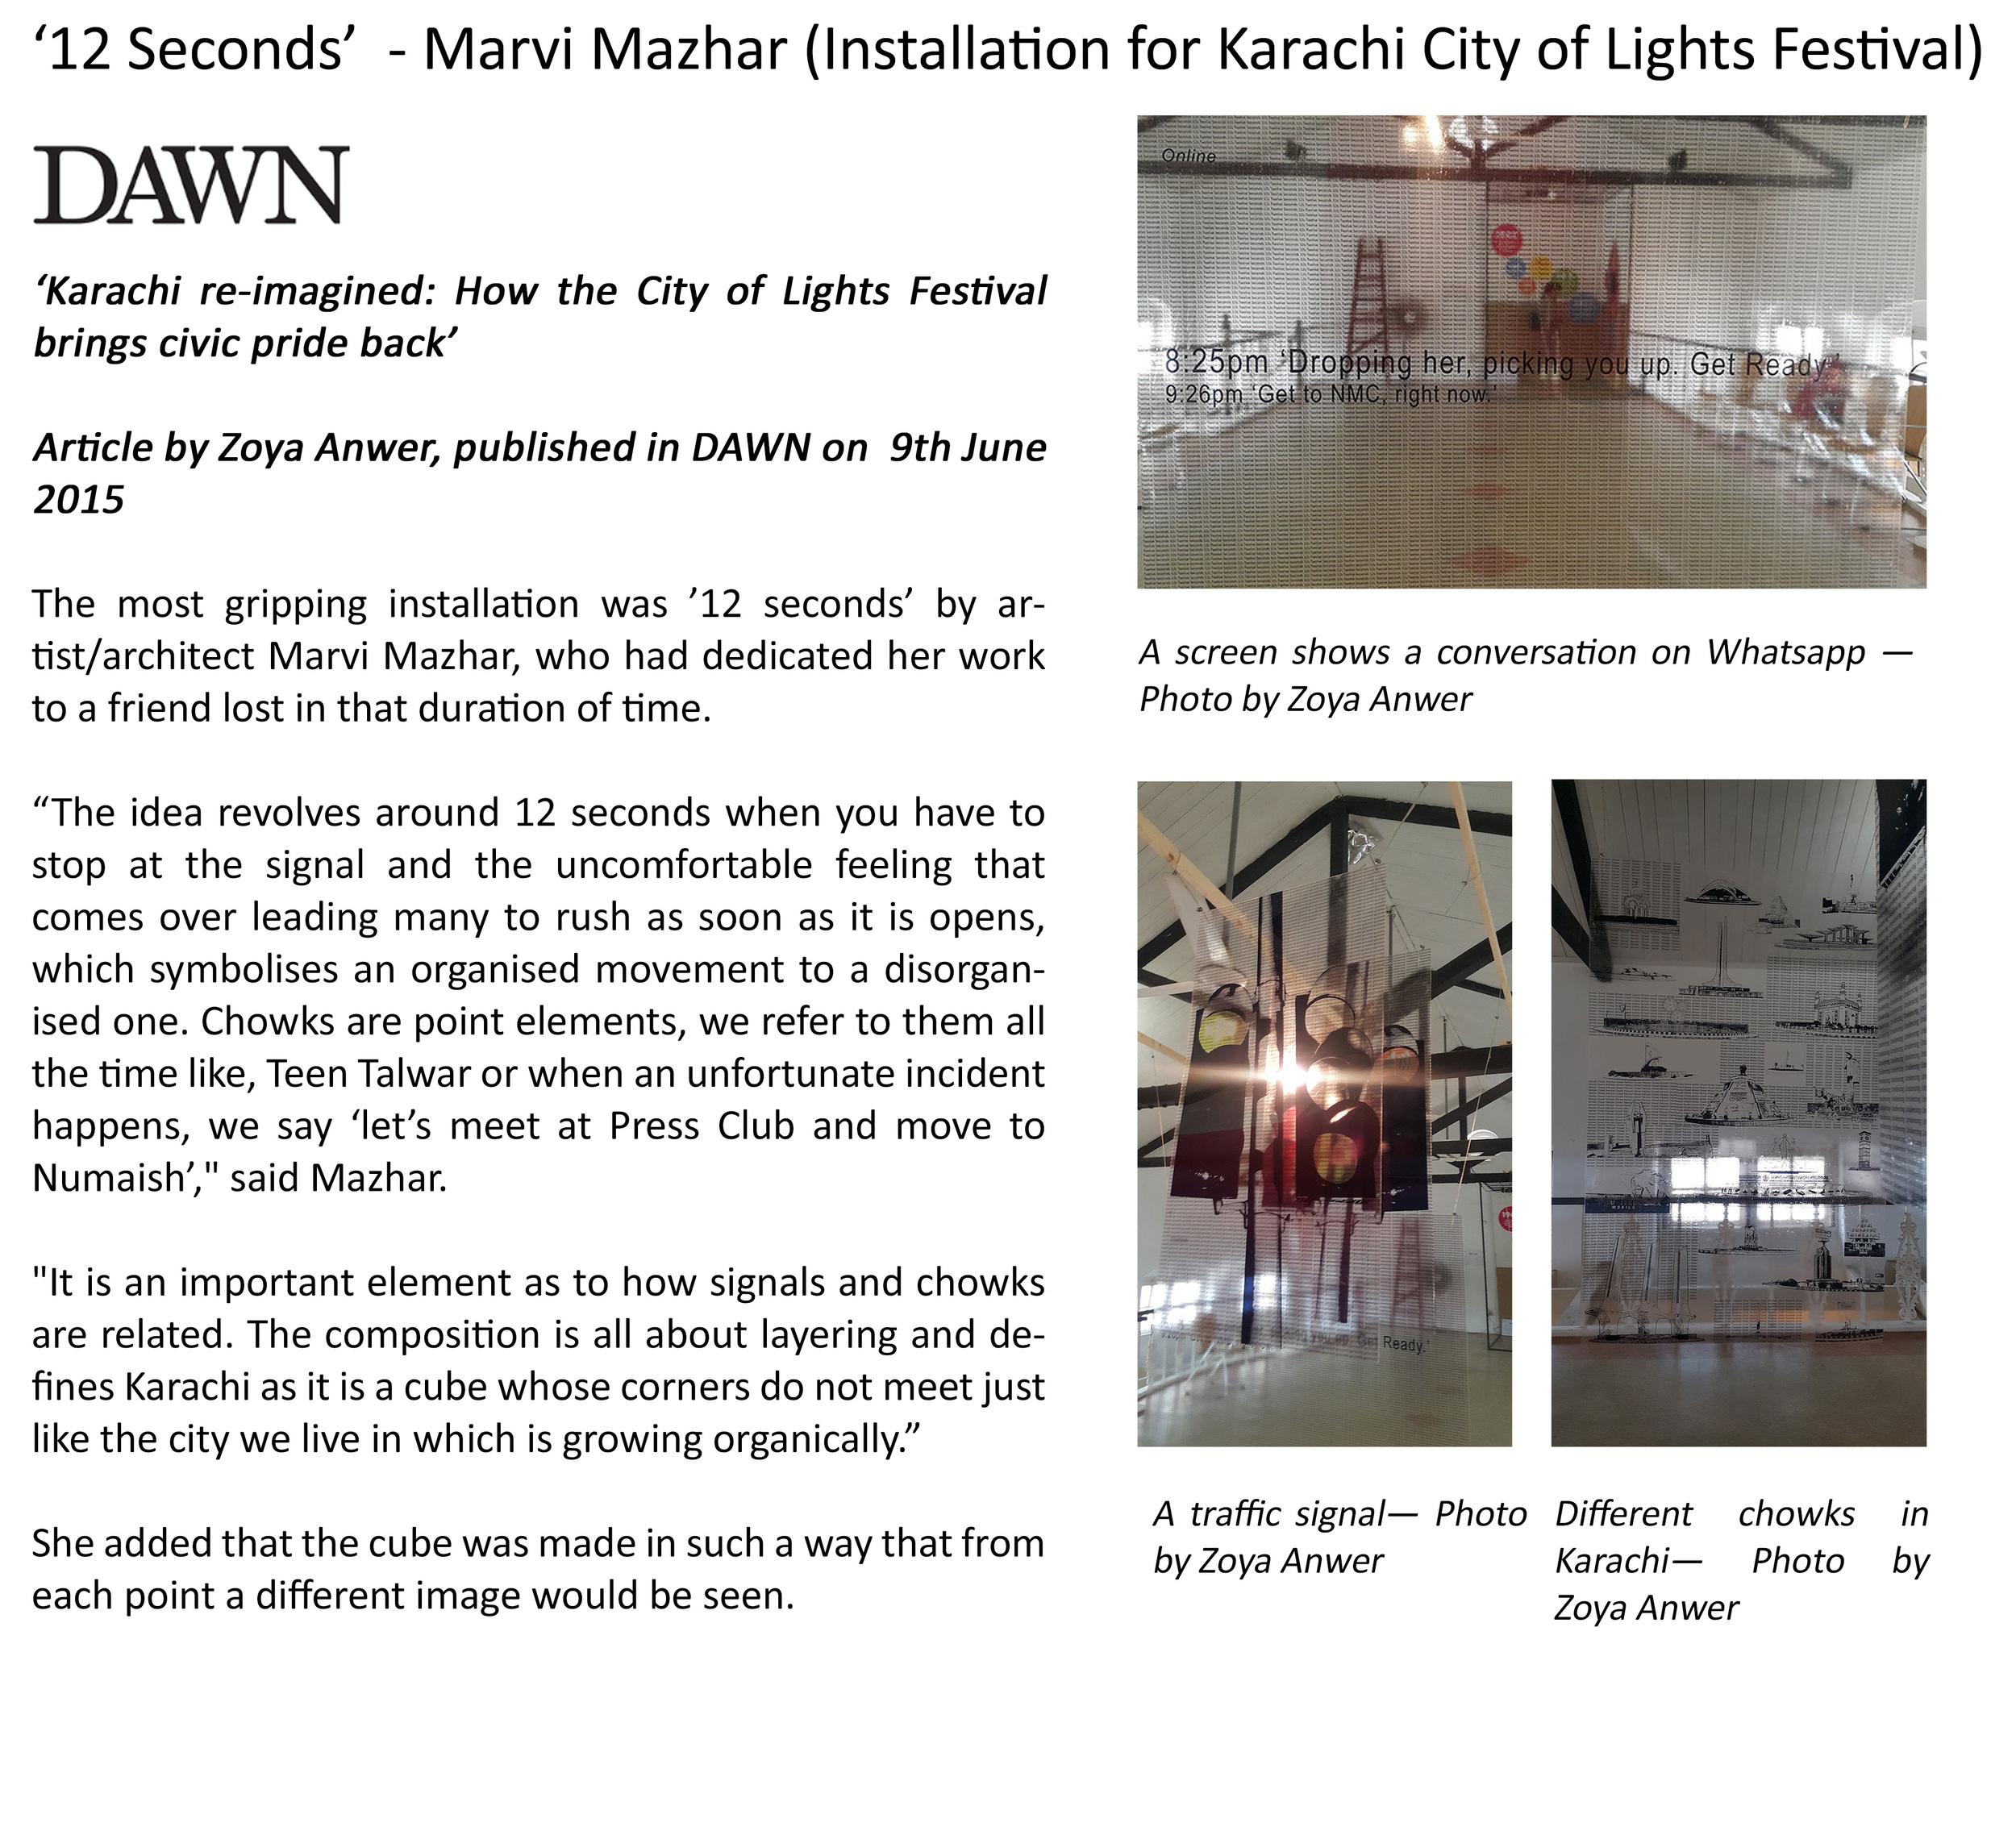 Karachi Re-Imagined: How the city of Lights Festival brings civic pride back.| 9th June 2015, Karachi.